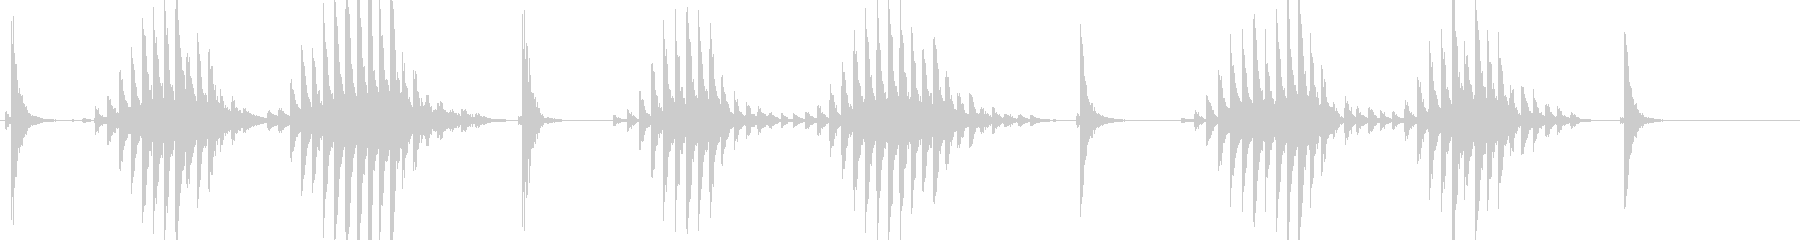 大太鼓11サザ浪歌舞伎情景描写和風和太鼓の未再生の波形